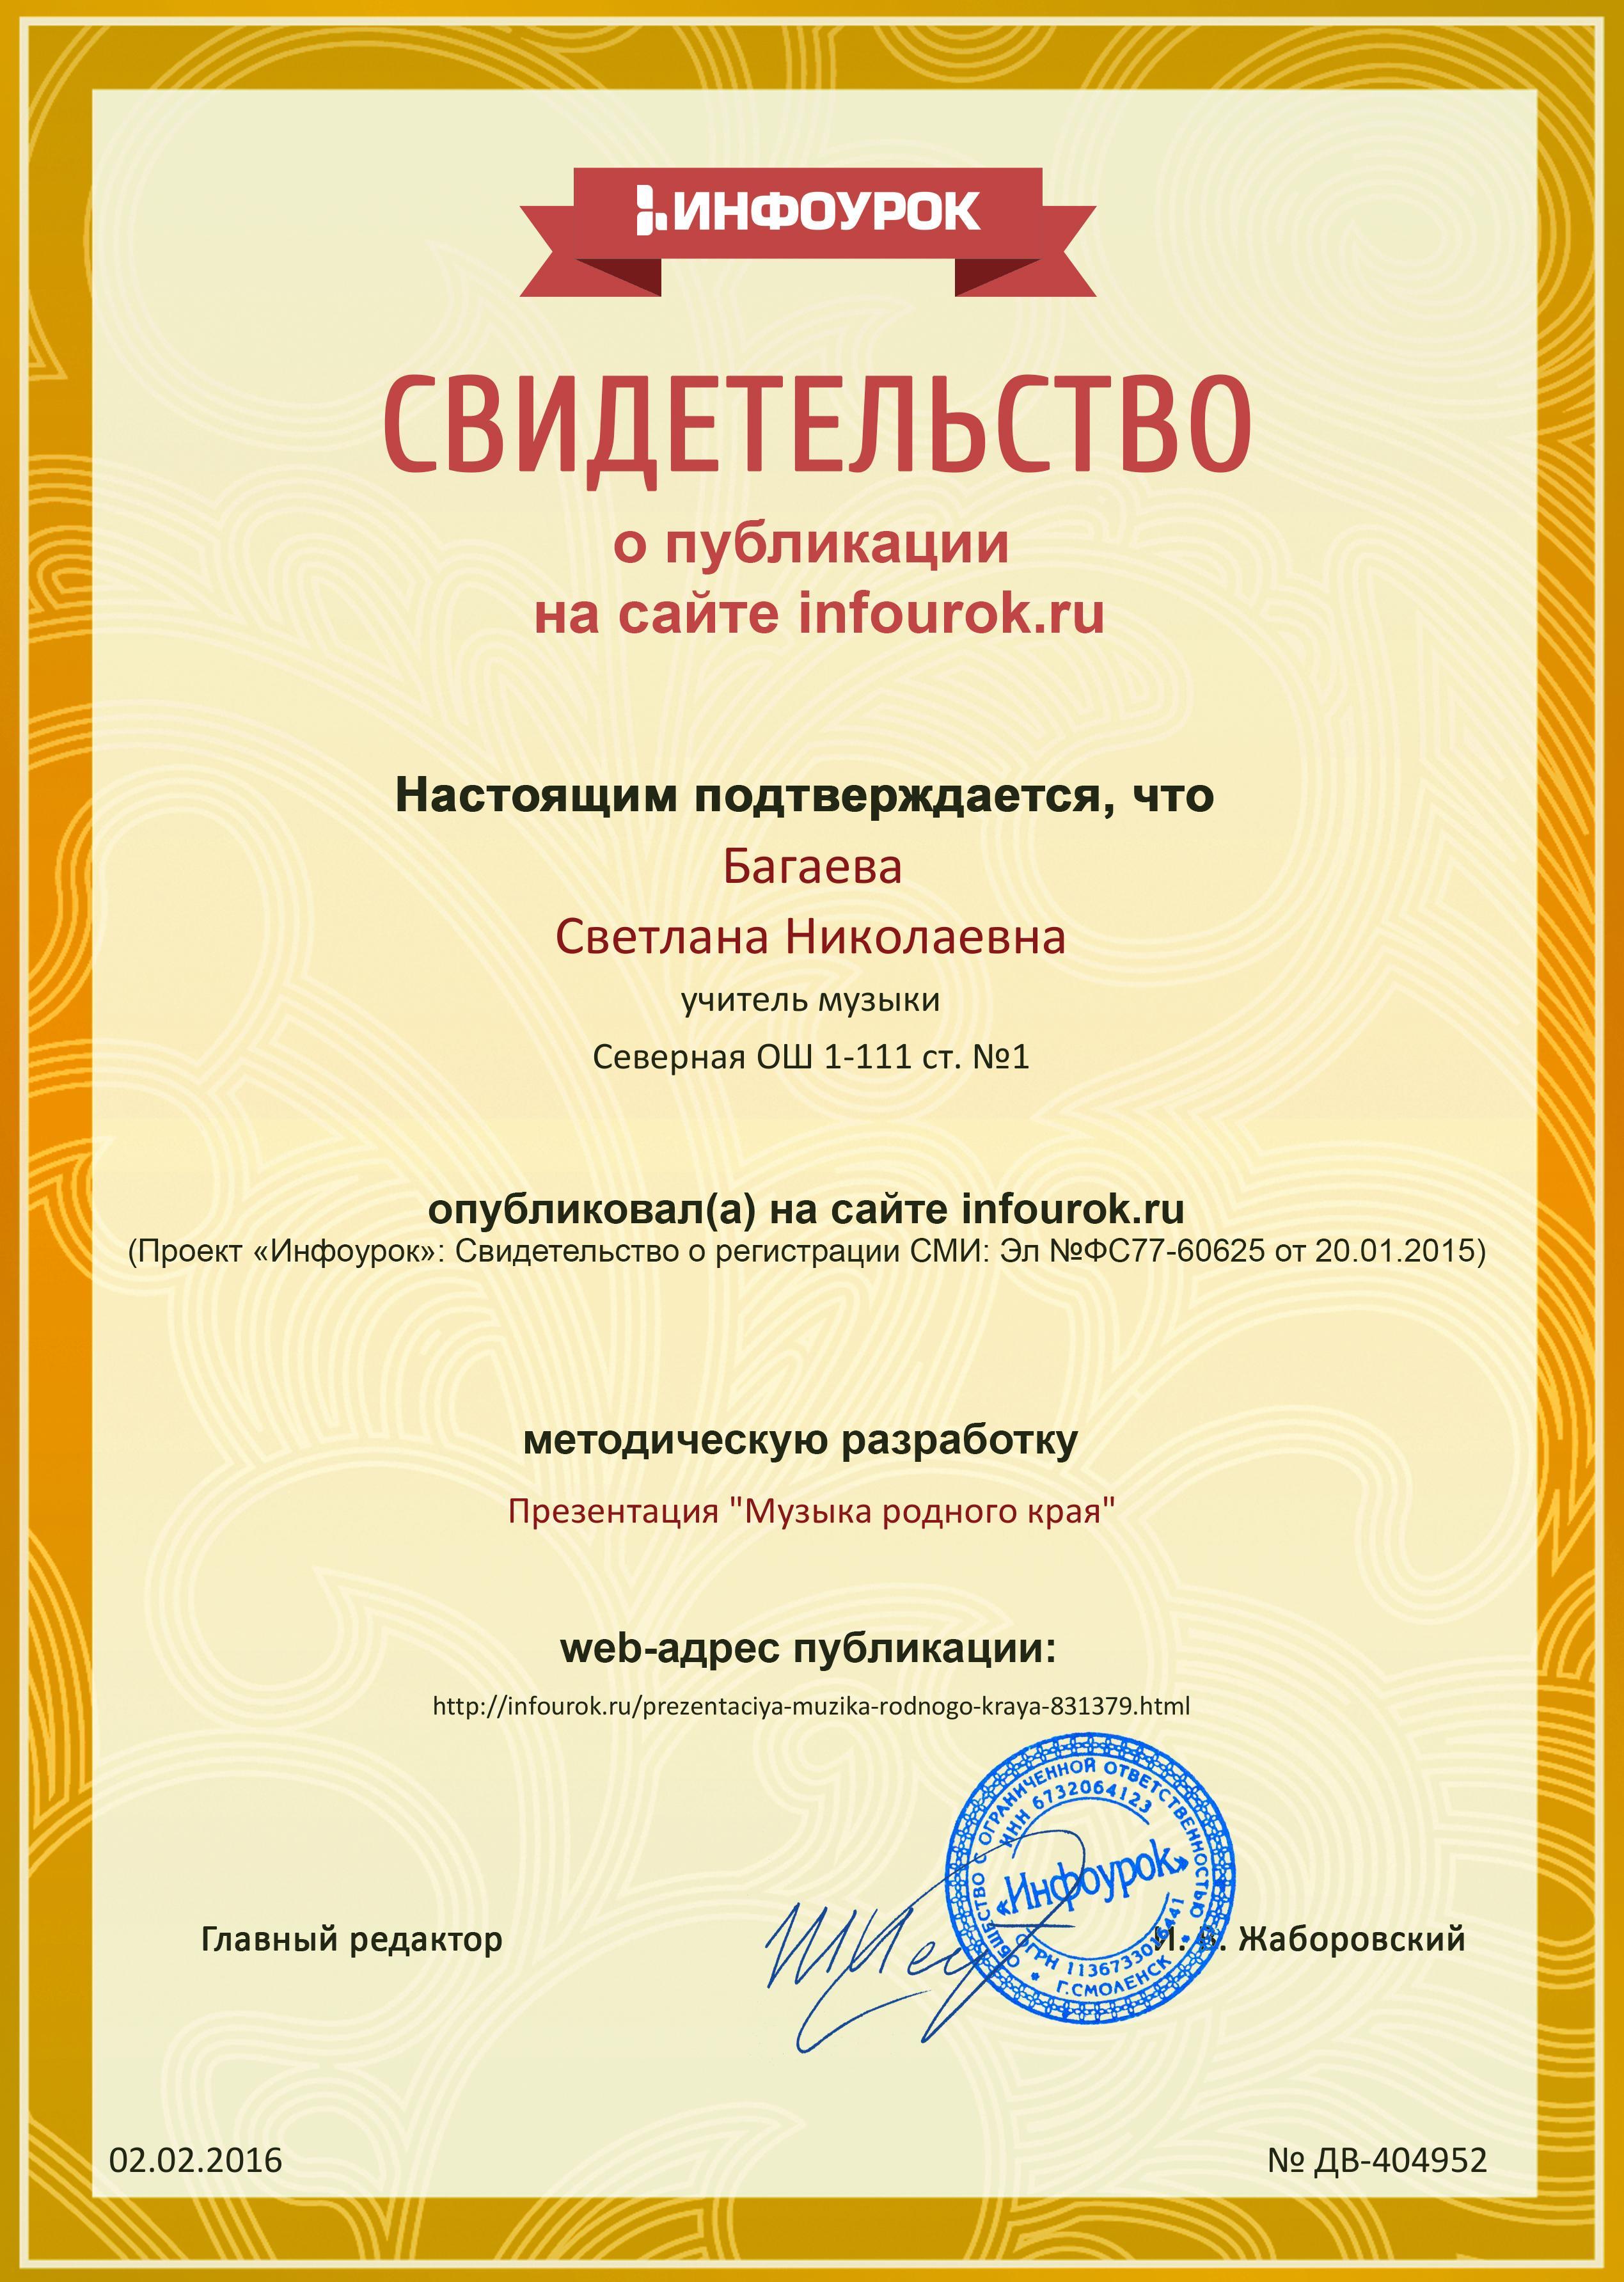 Сертификат проекта infourok.ru № ДВ-404952.jpg